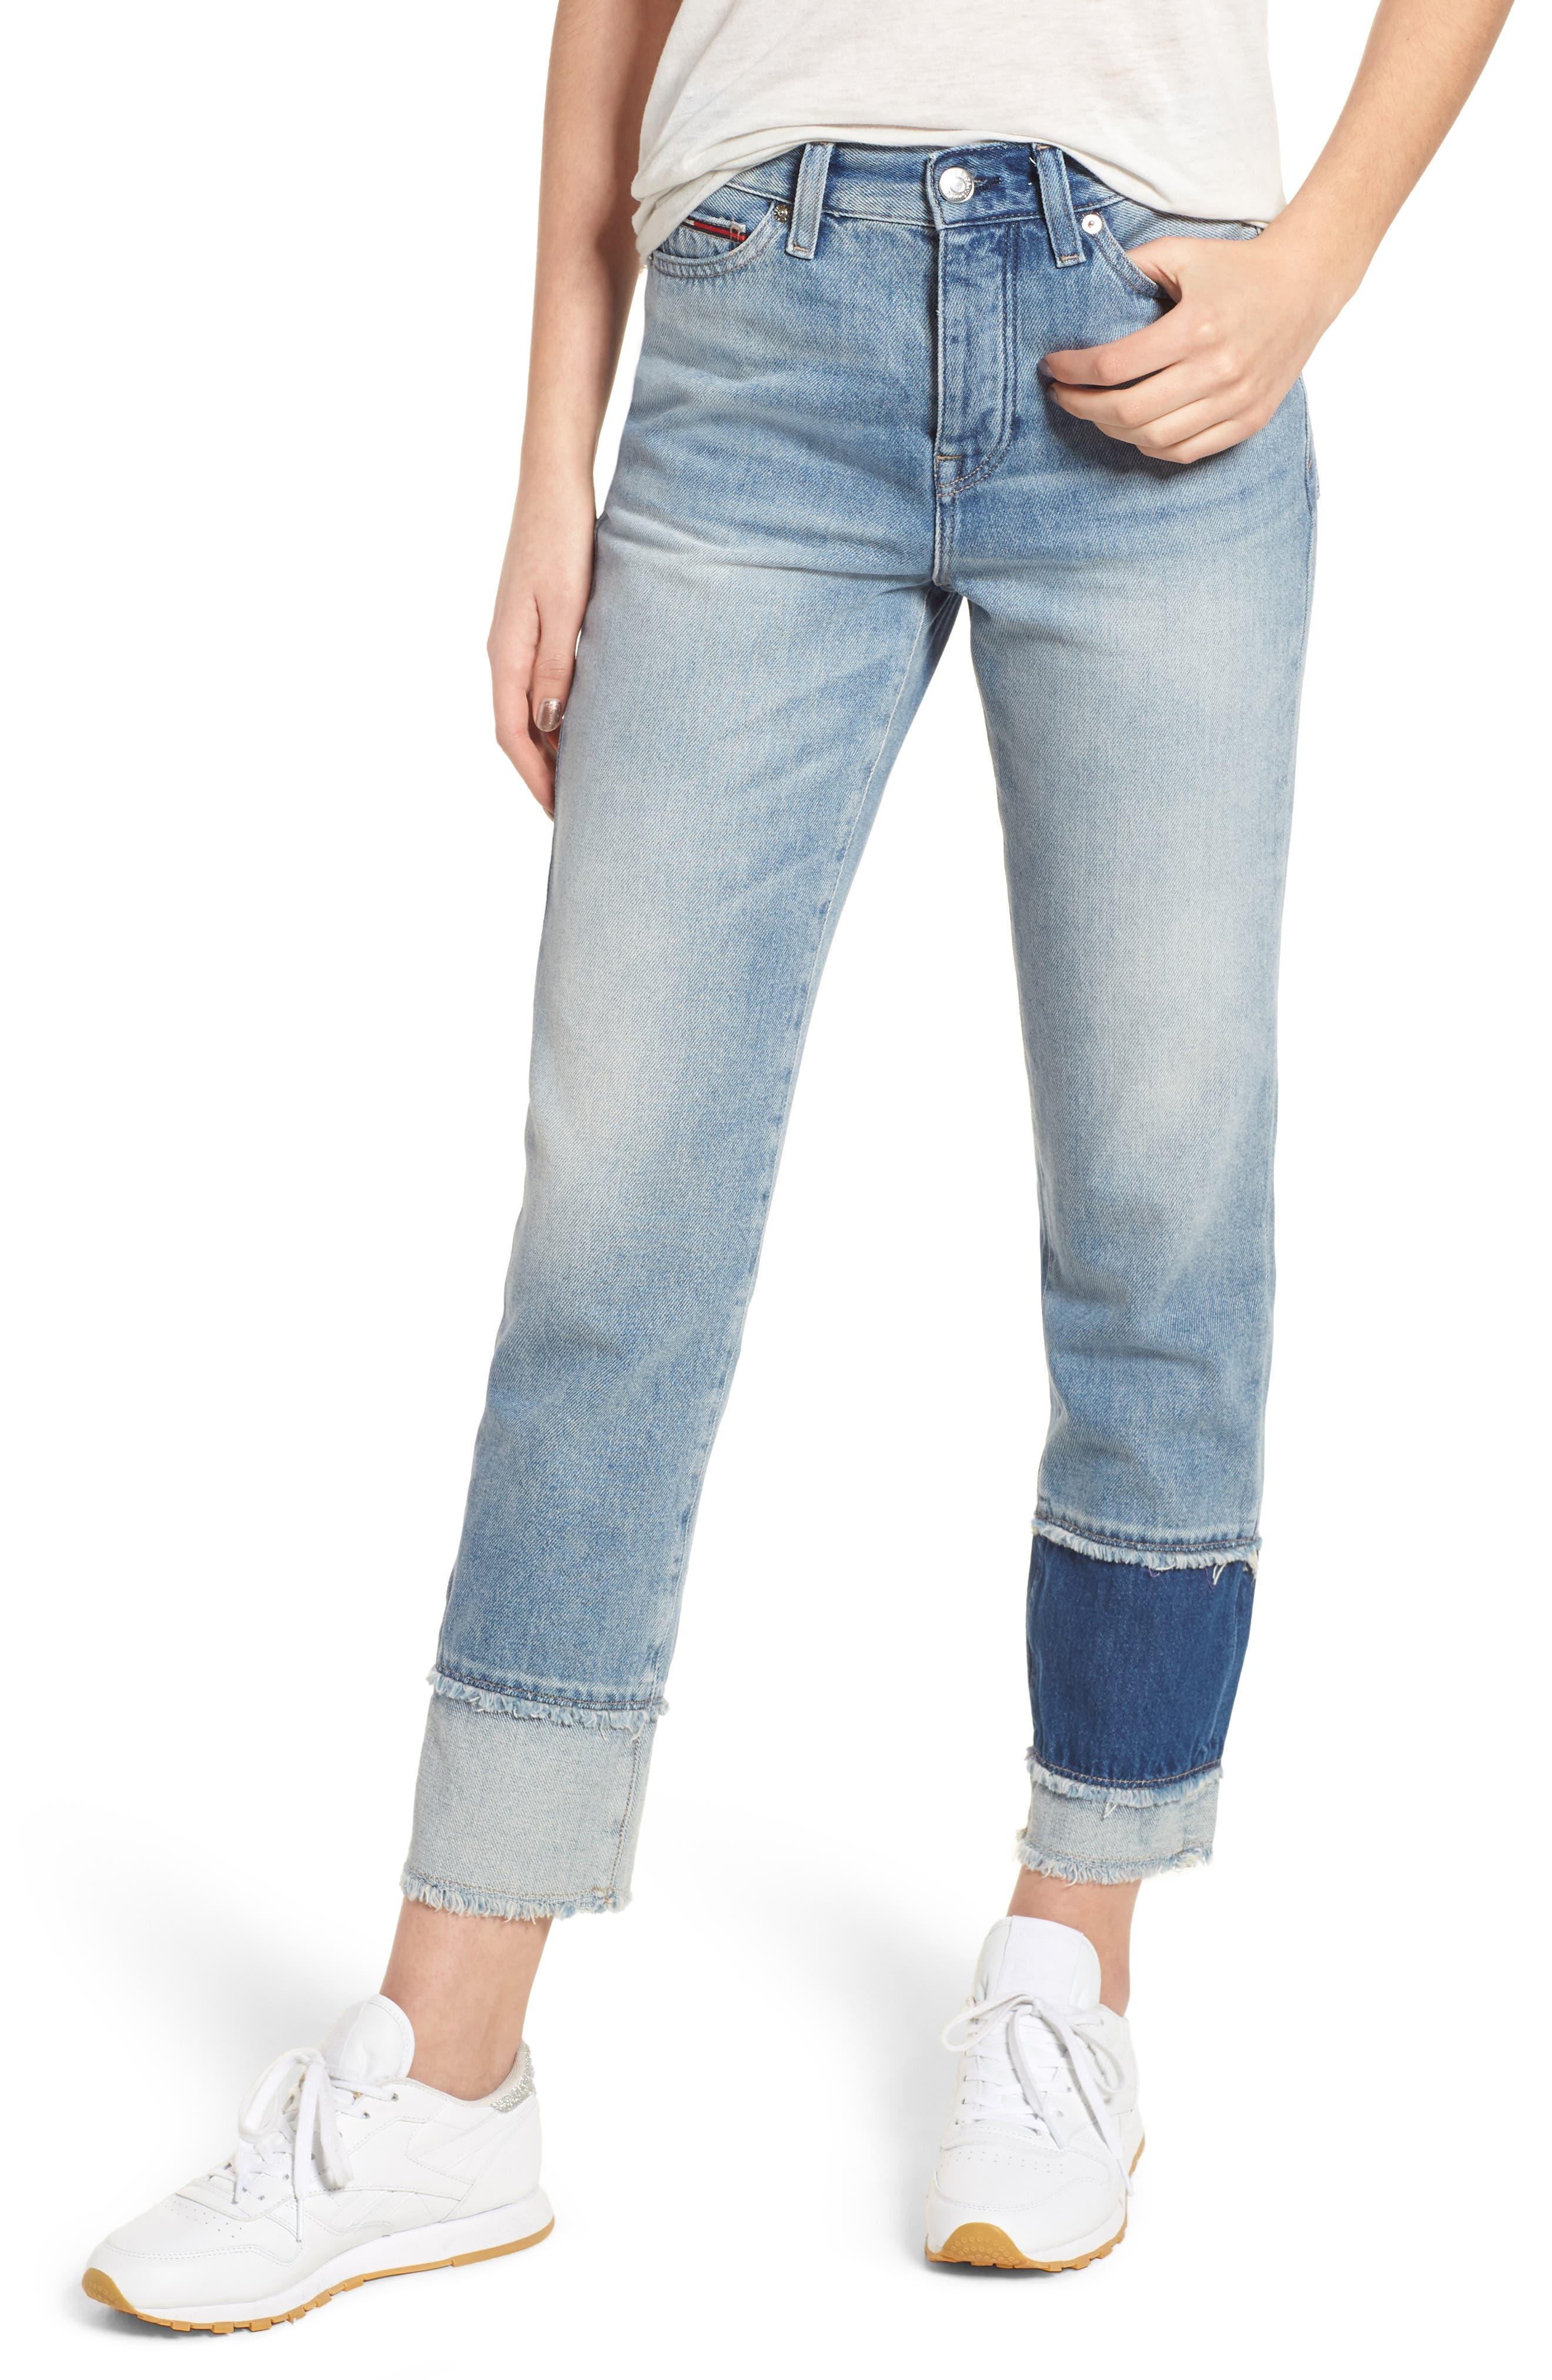 Izzy Layered Cuff Slim Leg Jeans,                             Main thumbnail 1, color,                             Raw Patch Light Blue Rigid